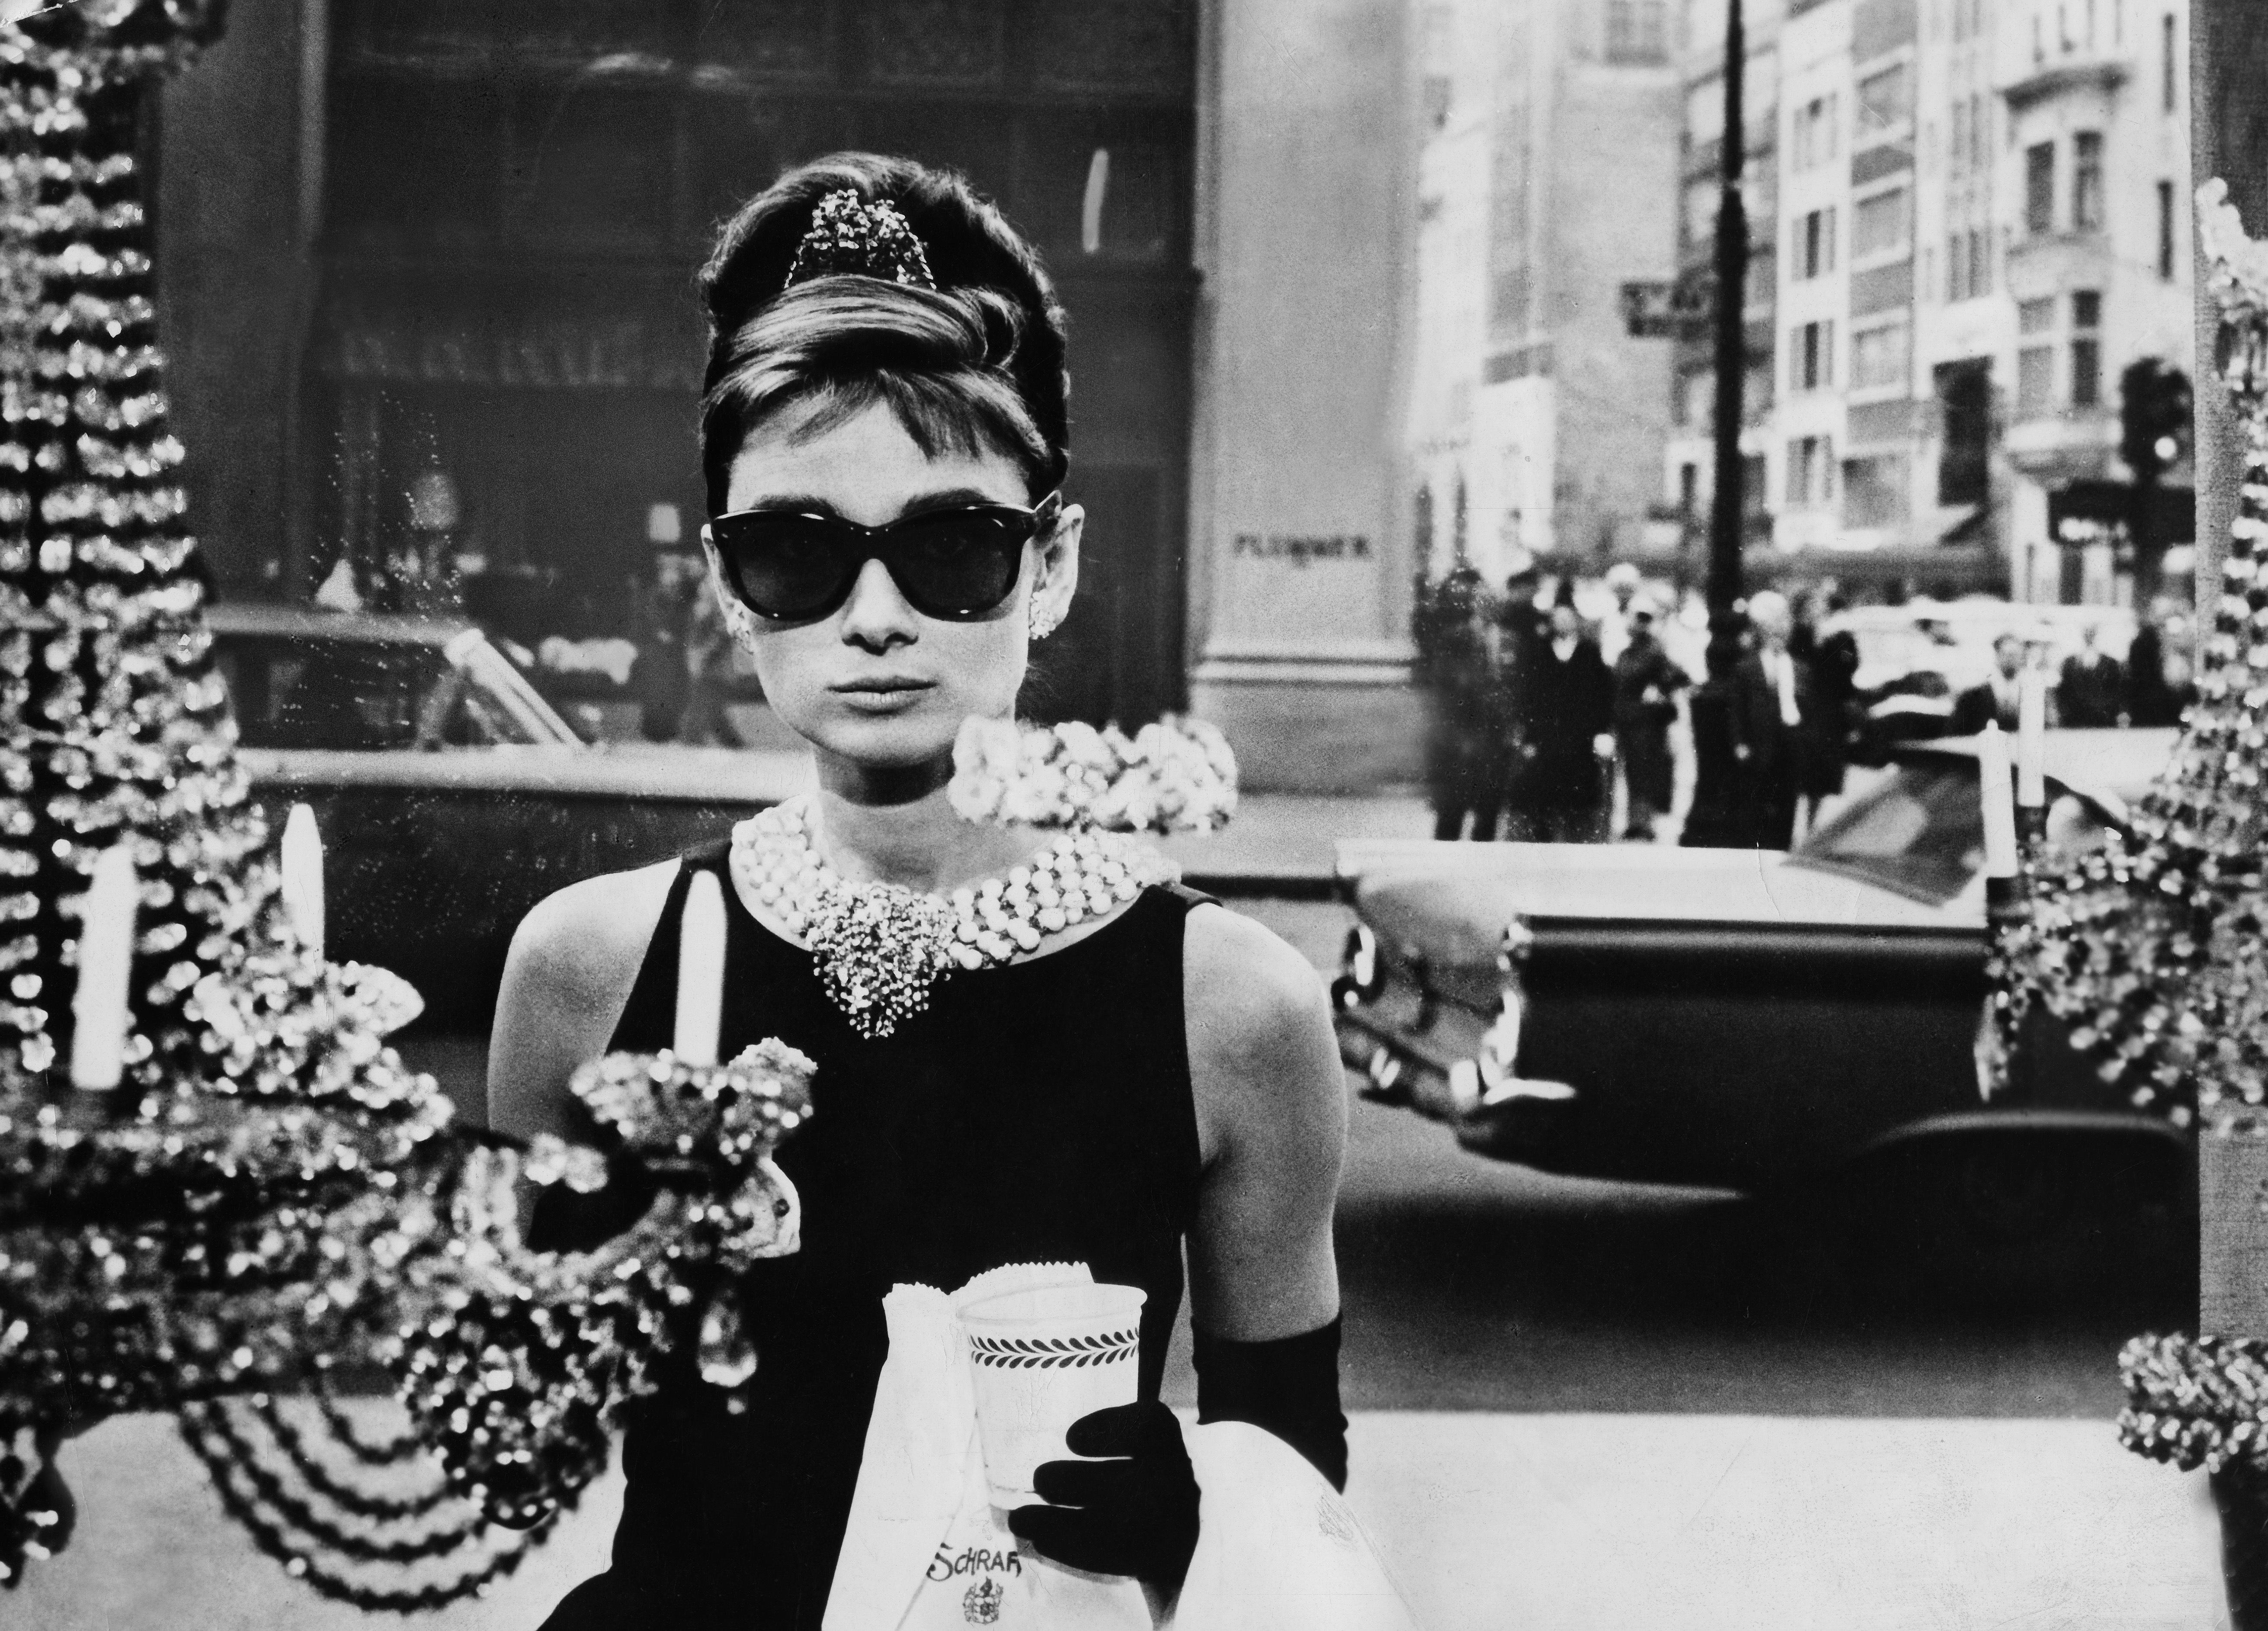 Hepburn, Audrey - Schauspielerin, in dem Film 'Fruehstueck bei Tiffany'